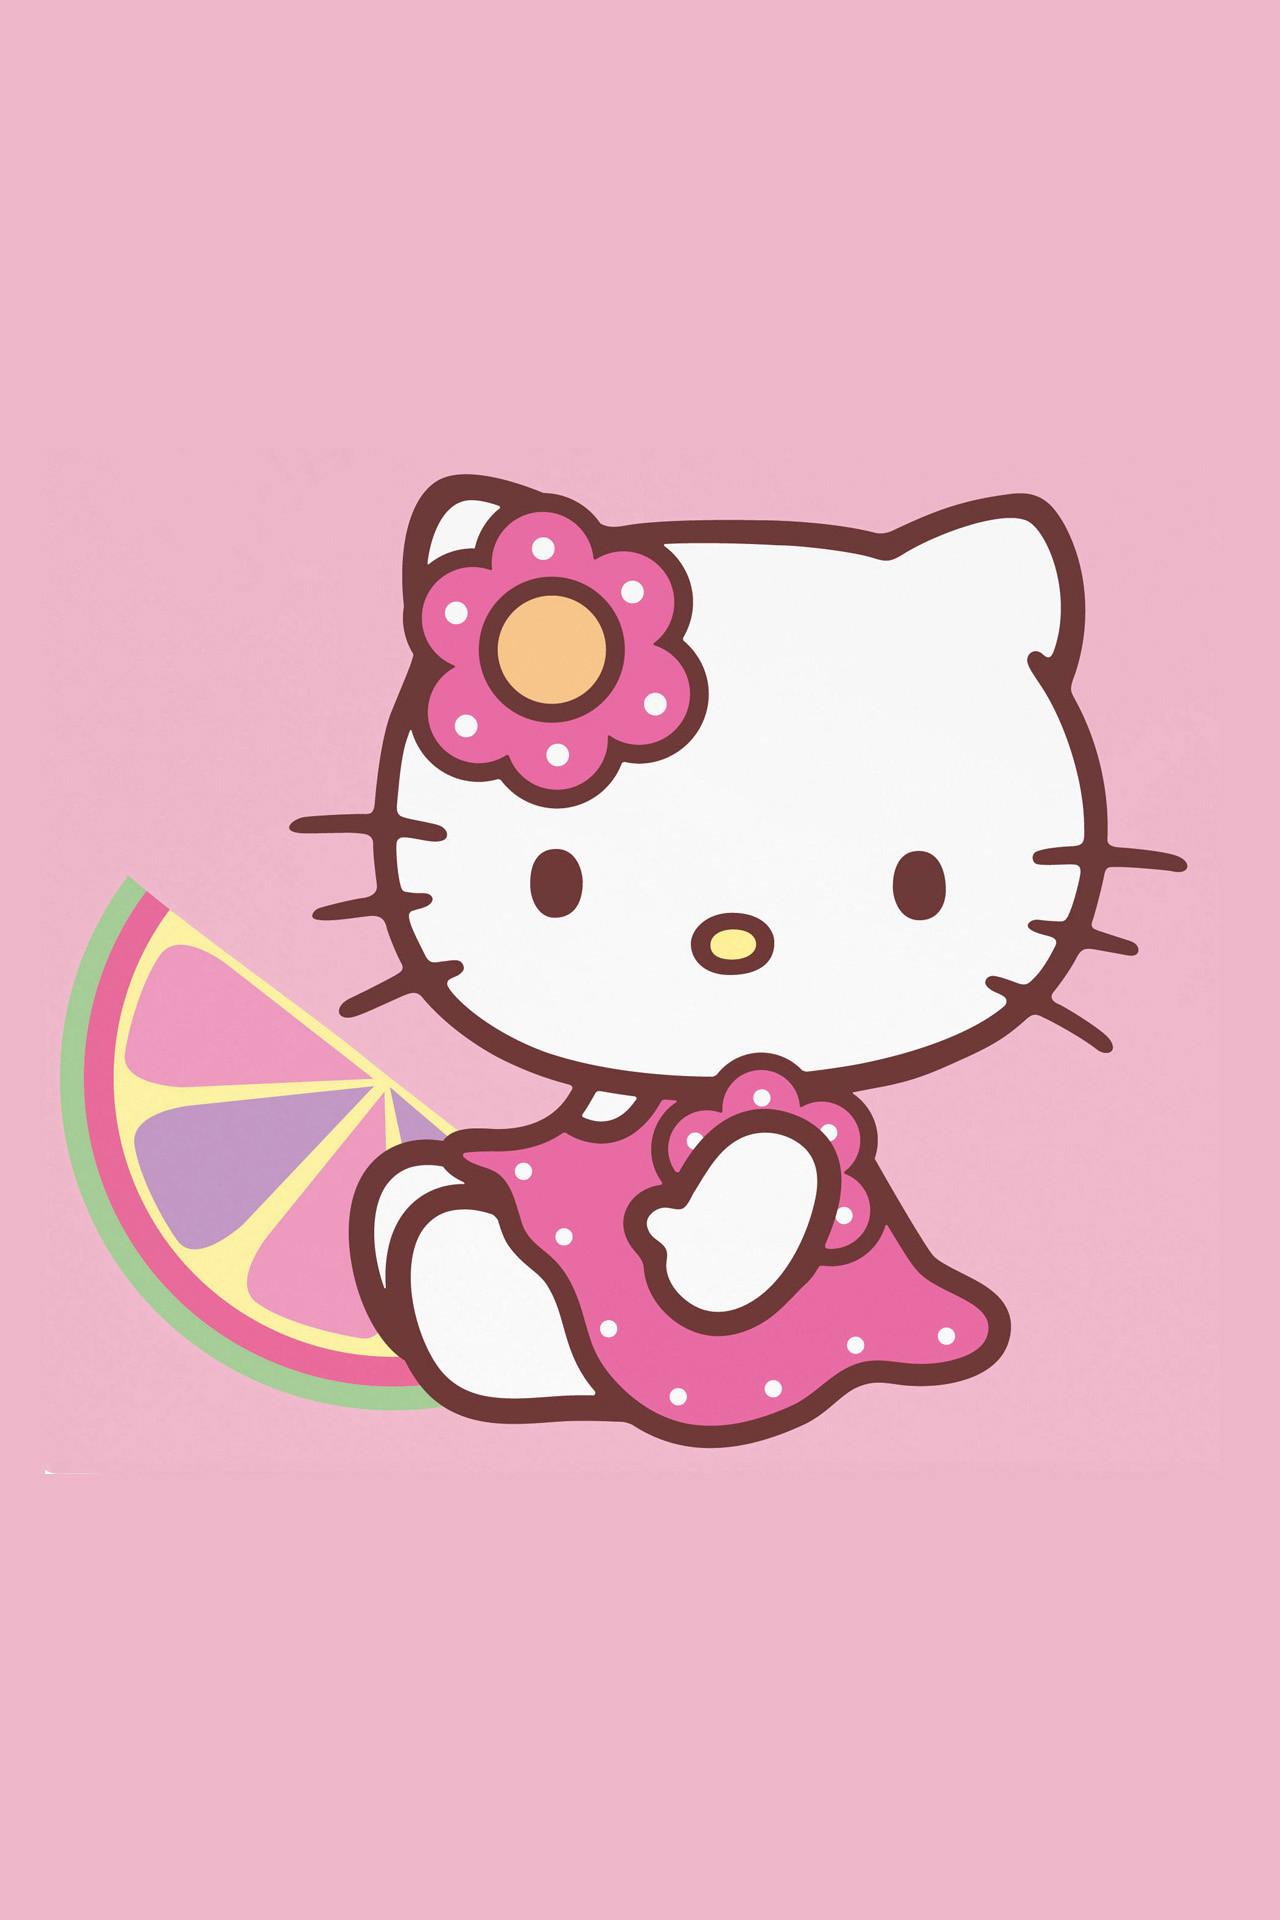 Best Wallpaper Hello Kitty Note 5 - 585528  Image_644964.jpg